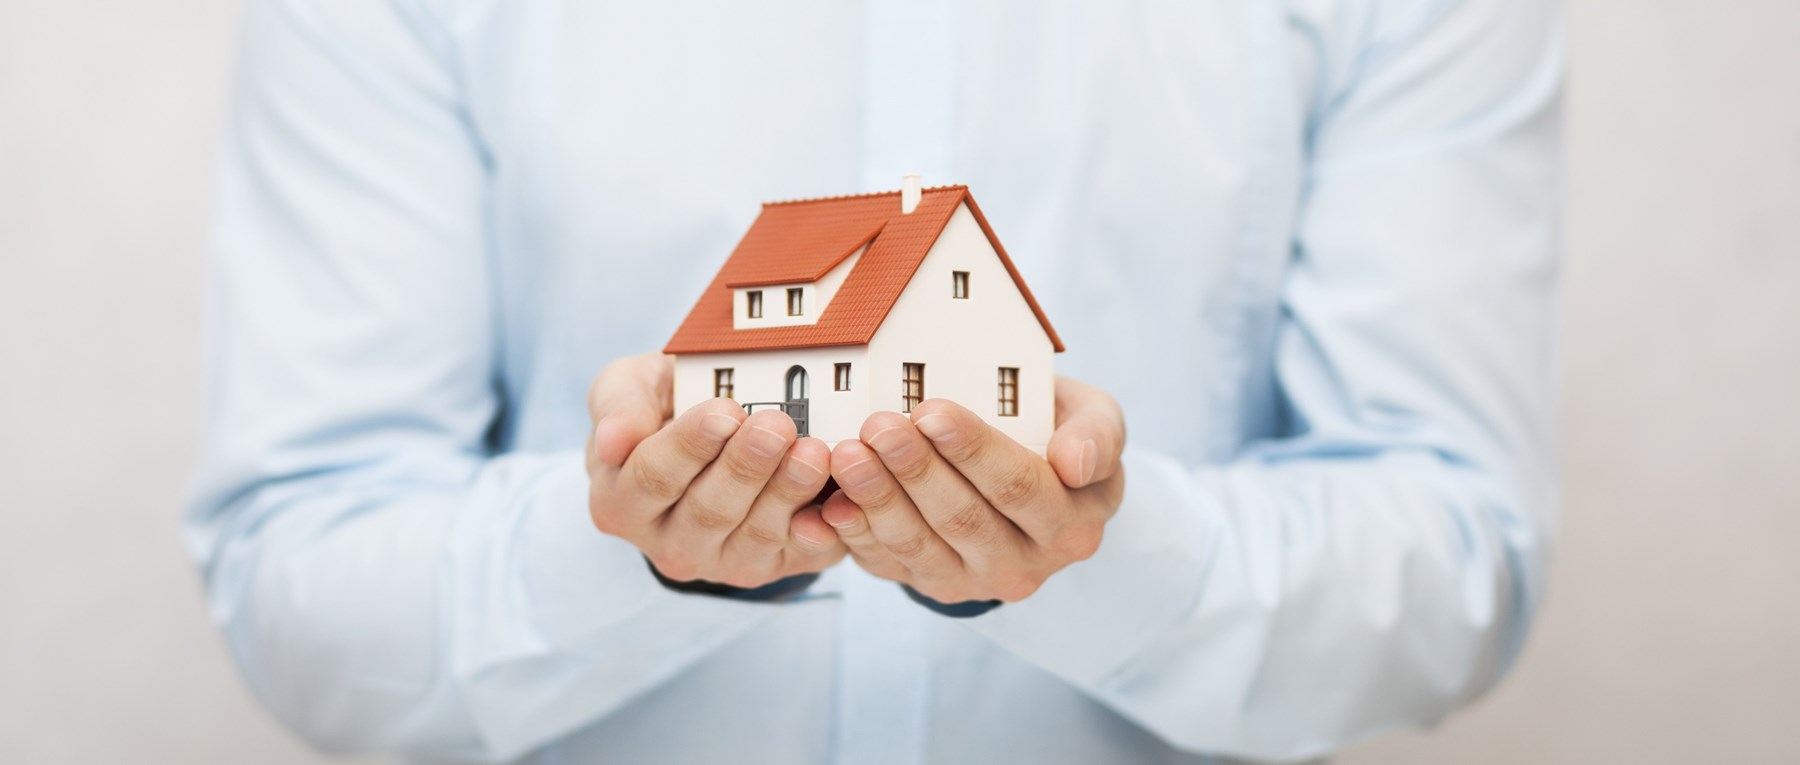 Man's hands holding model house